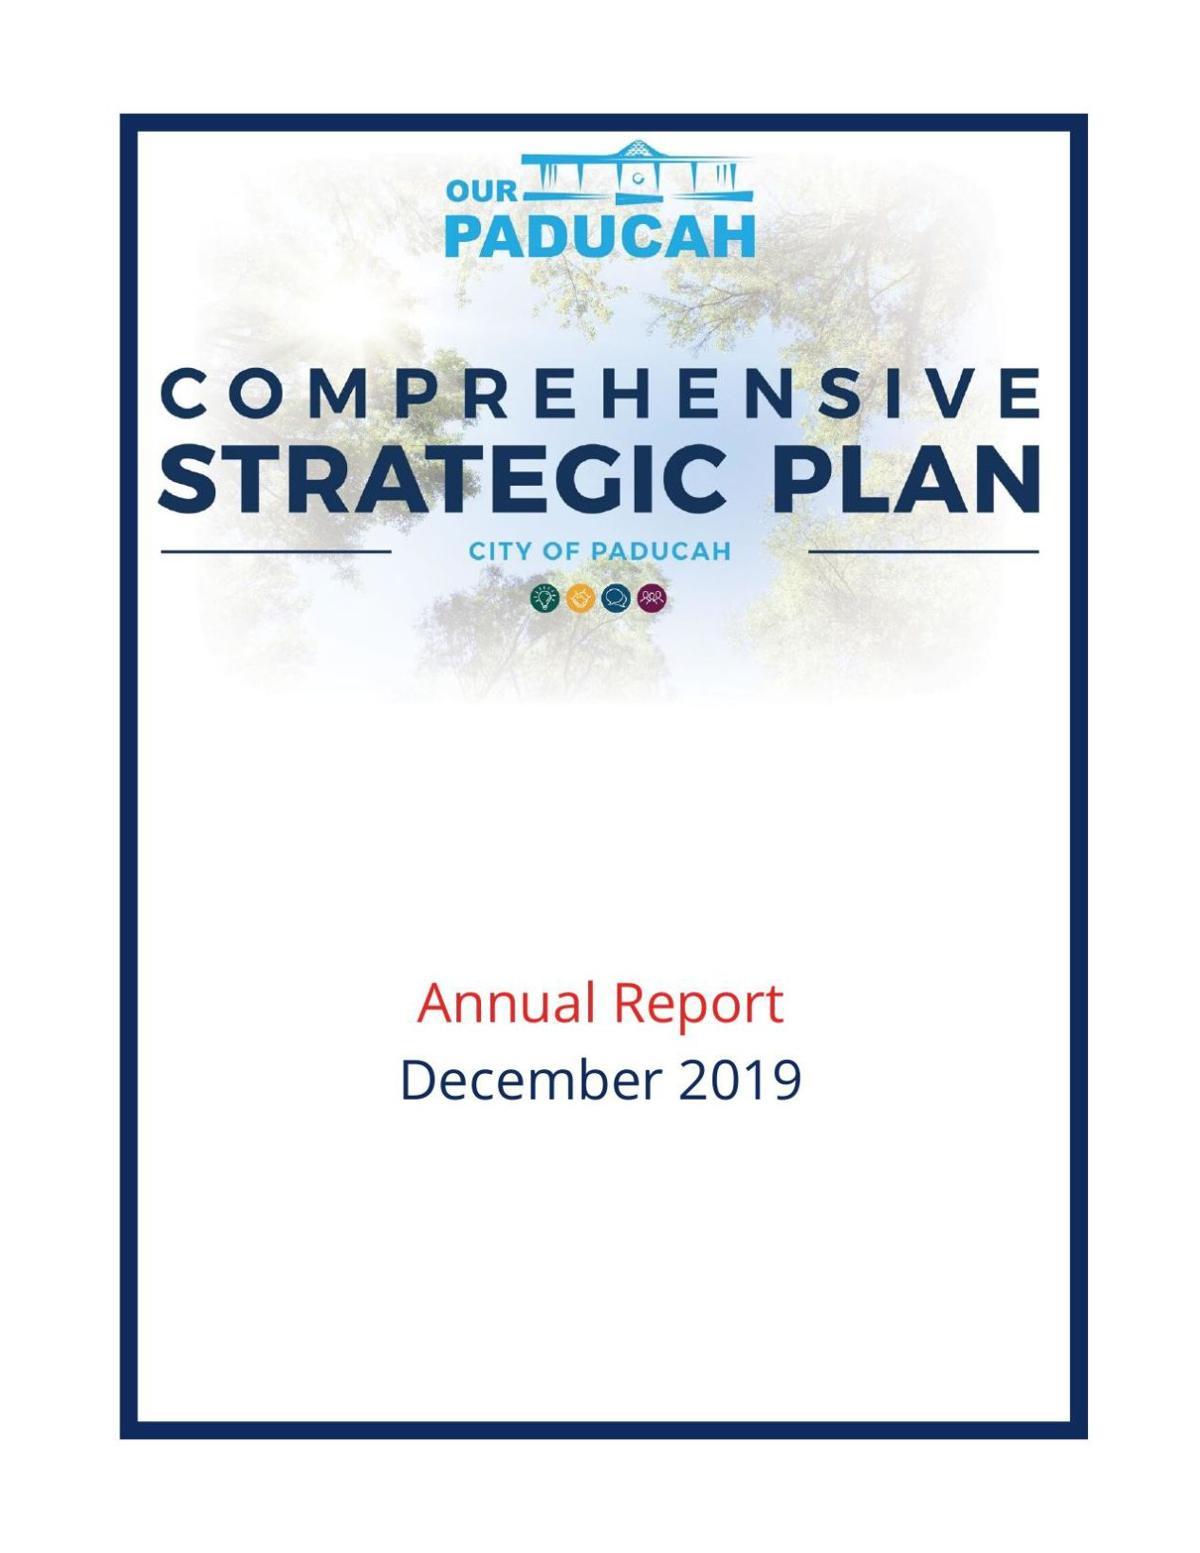 Strategic-Plan-2019-Annual-Report.pdf